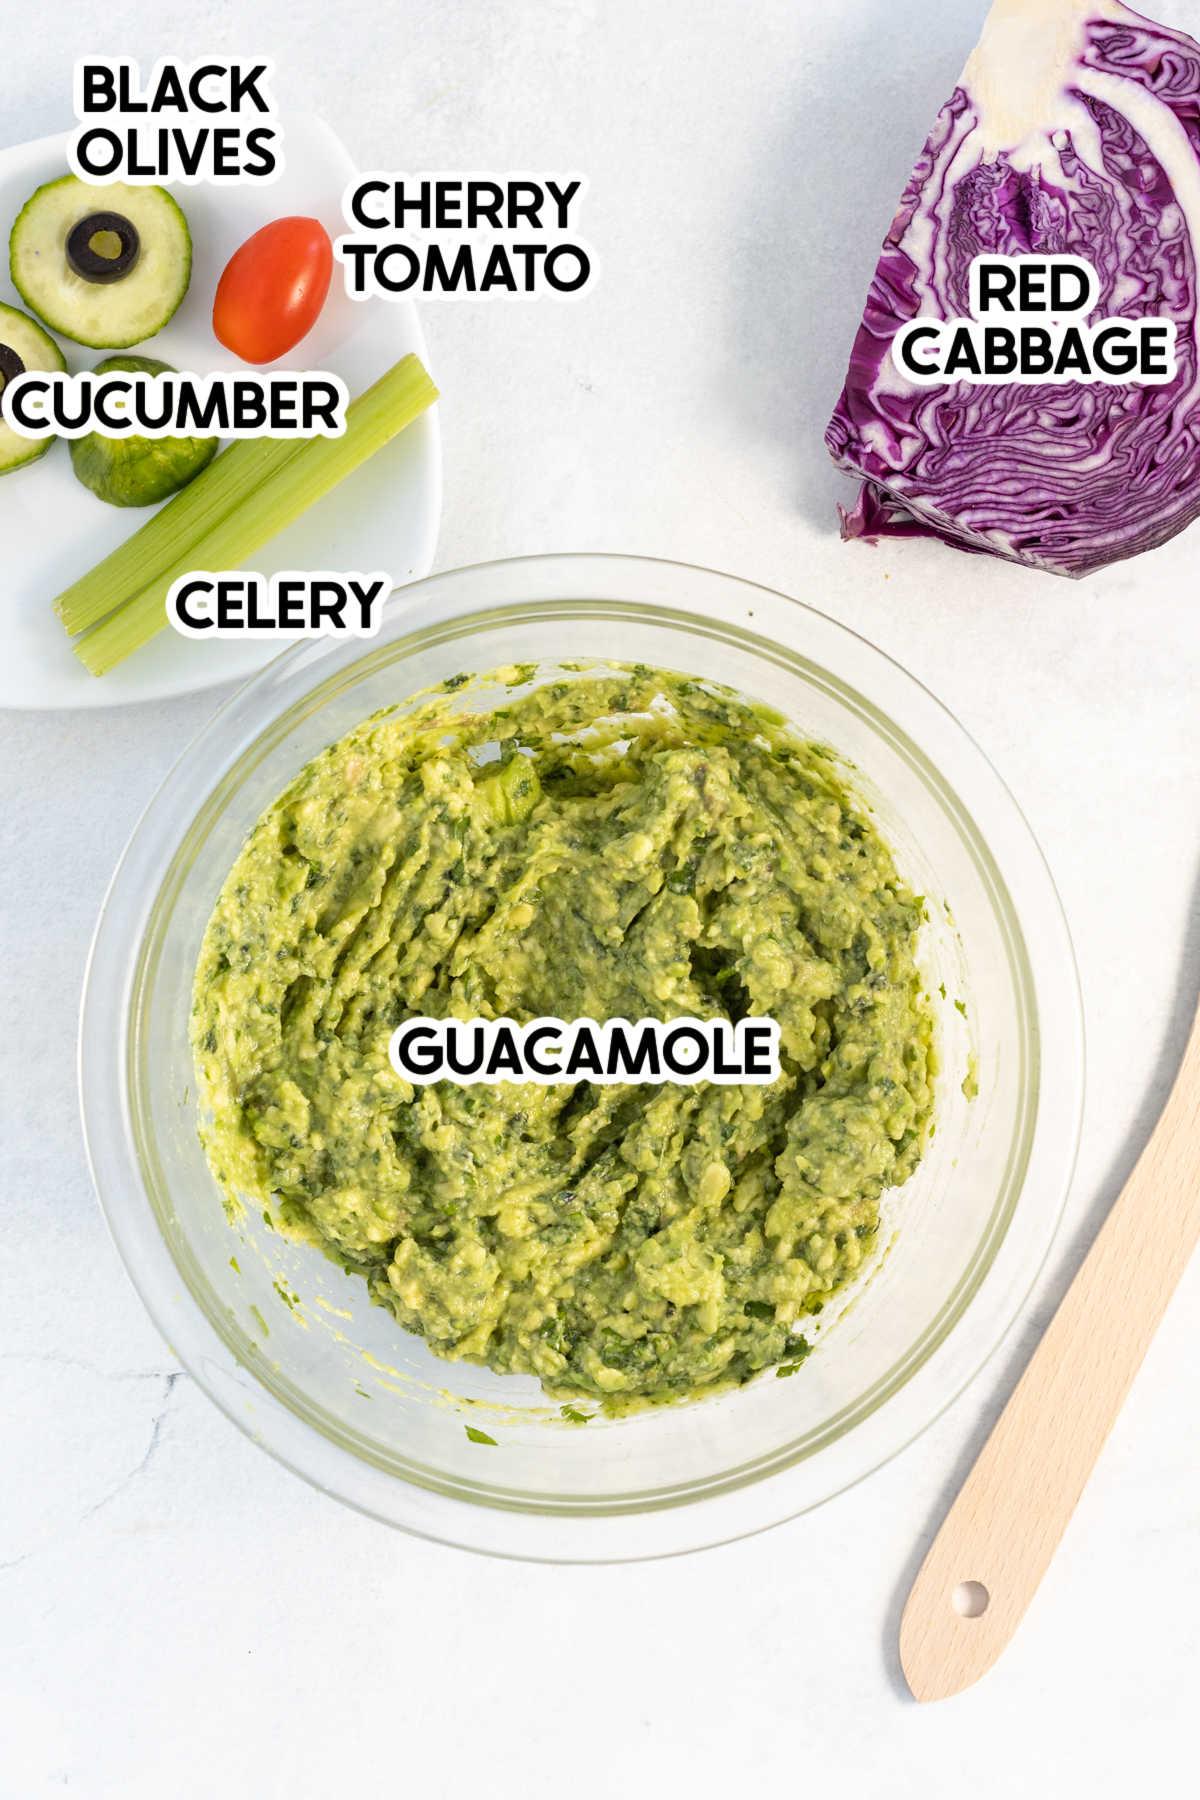 Frankenstein guacamole ingredients with labels